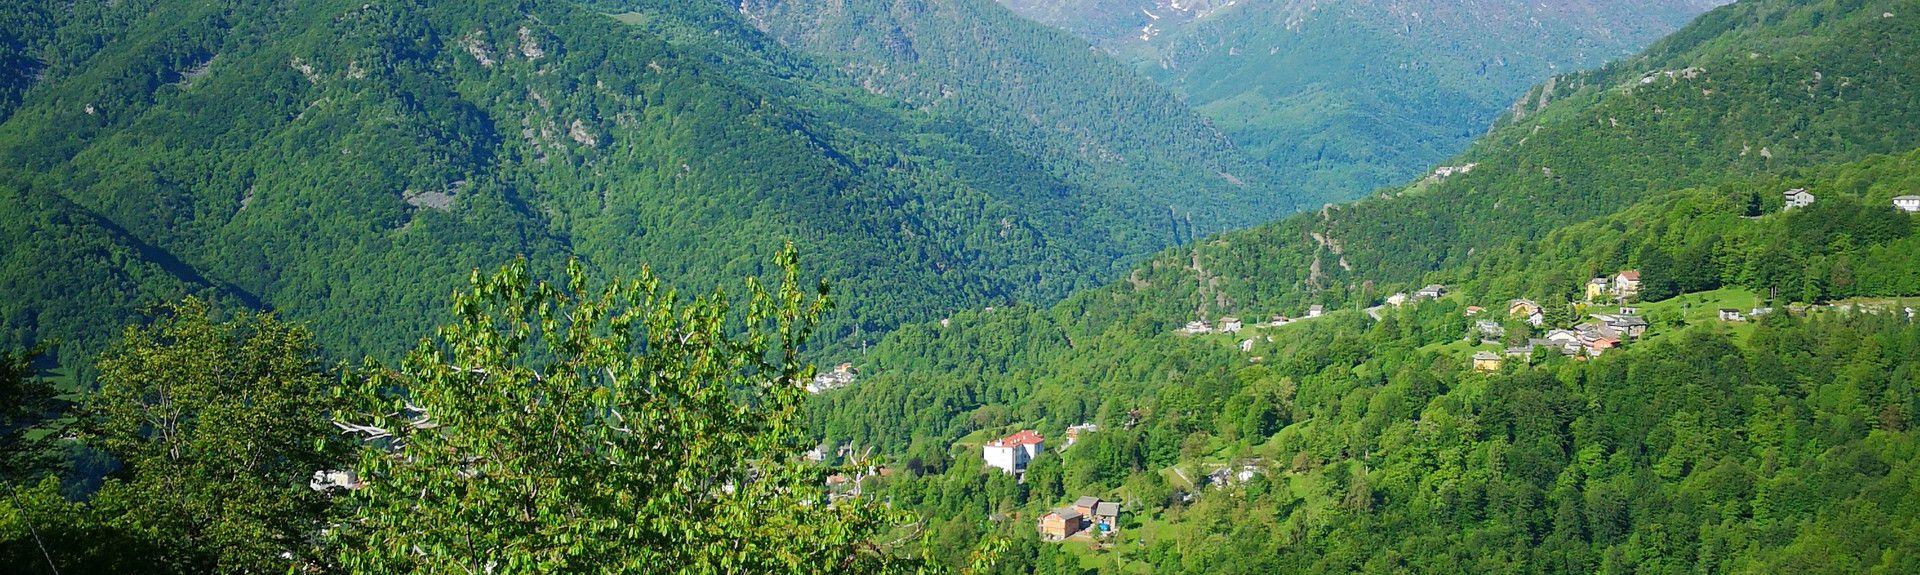 Druento, Piedmont, Italië